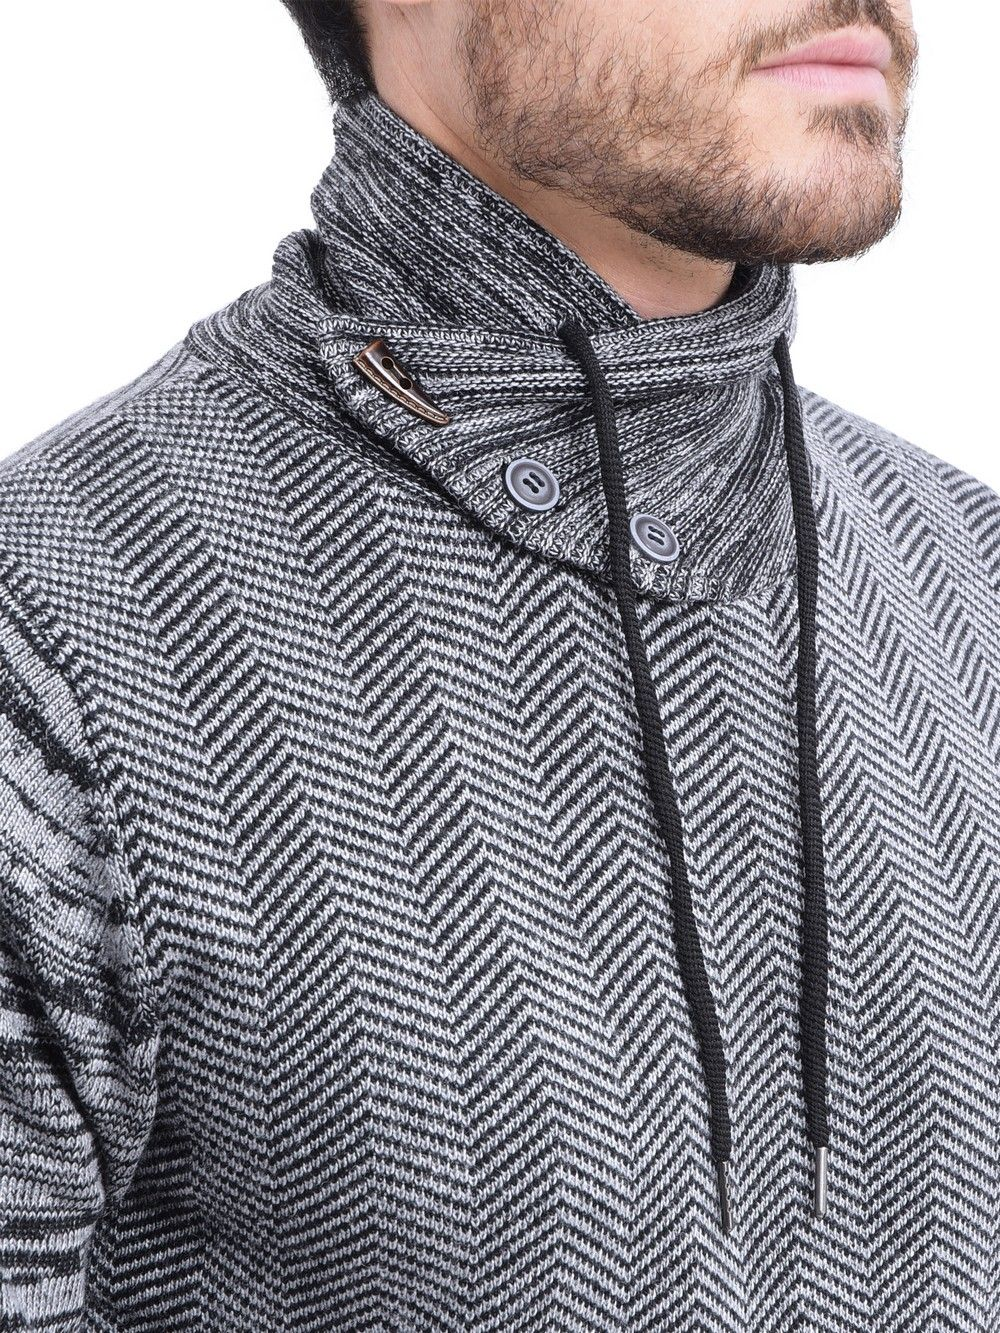 William De Faye Shawl Collar Jacquard Sweater with Cords in Black